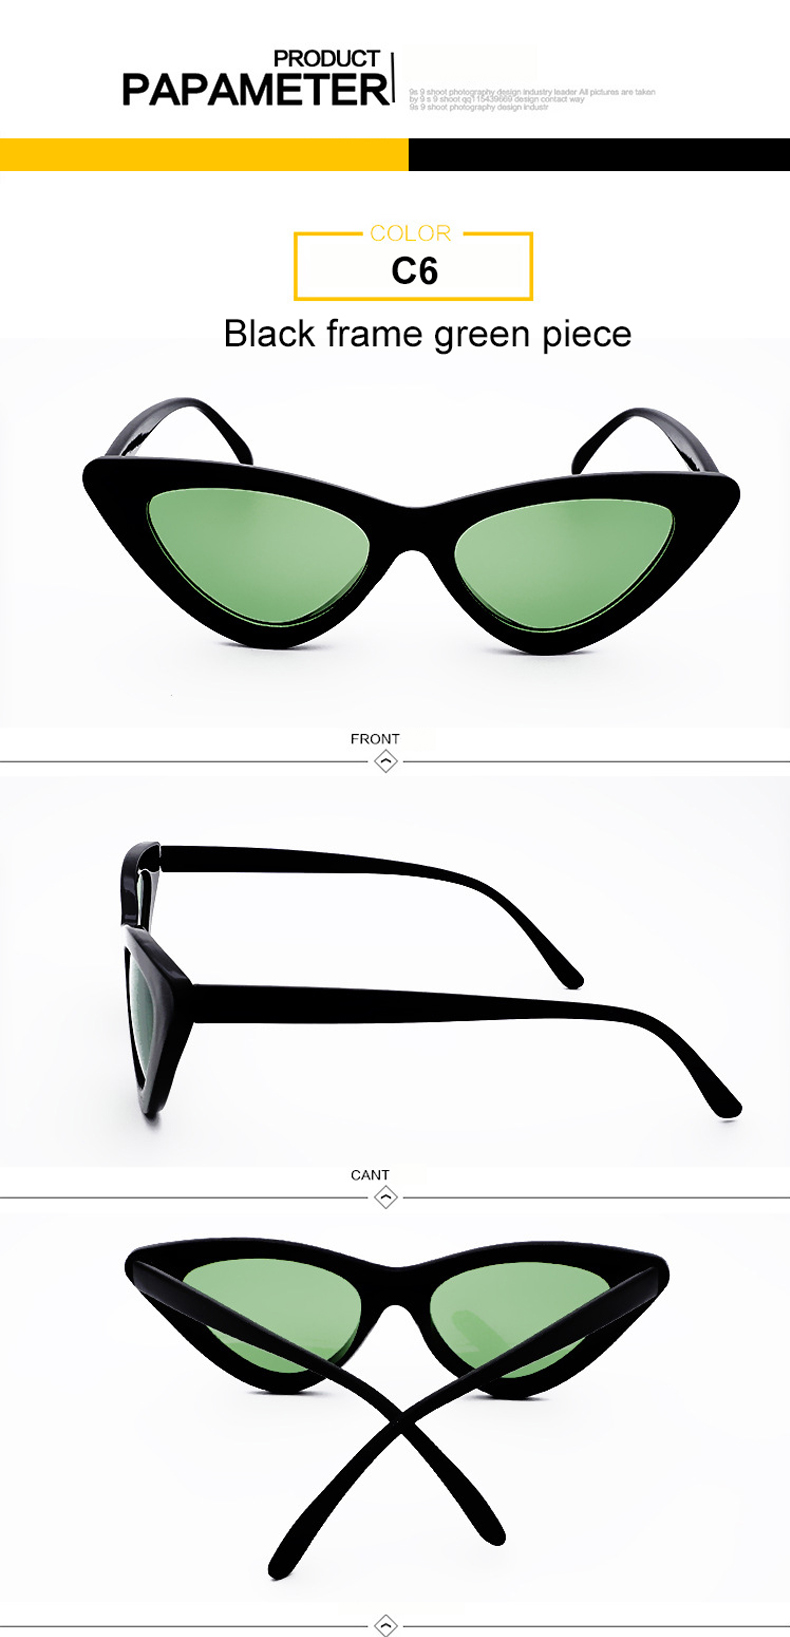 HTB1ovu2jqigSKJjSsppq6ybnpXan - WHO CUTIE 2018 Brand Designer Black Cat Eye Sunglasses Women Cool Small Cateye Frame Sun Glasses Fashion UV400 Shades WG-008